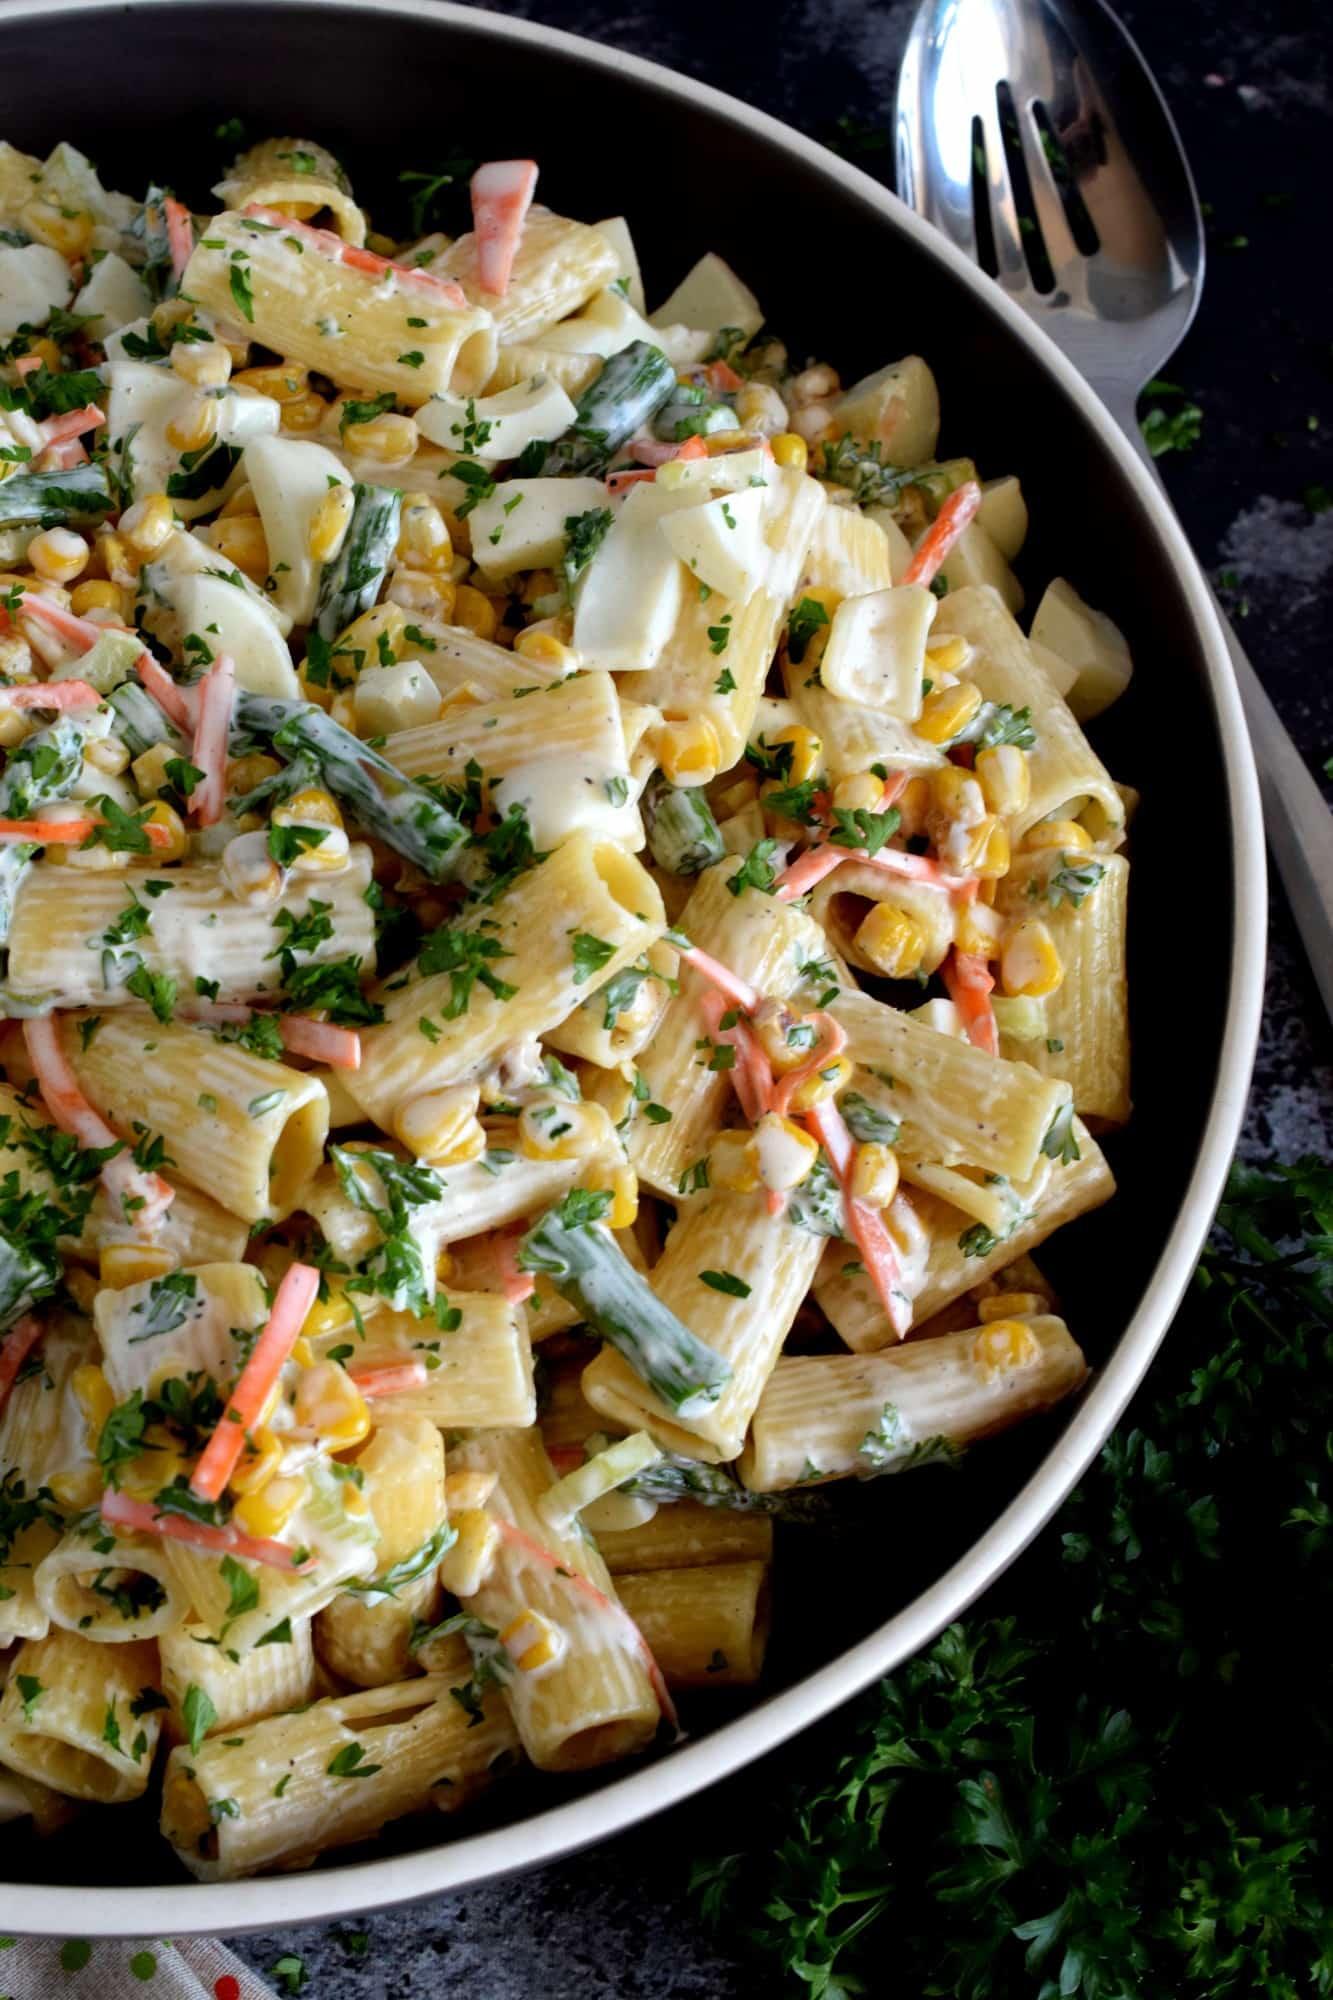 Asparagus and Egg Pasta Salad